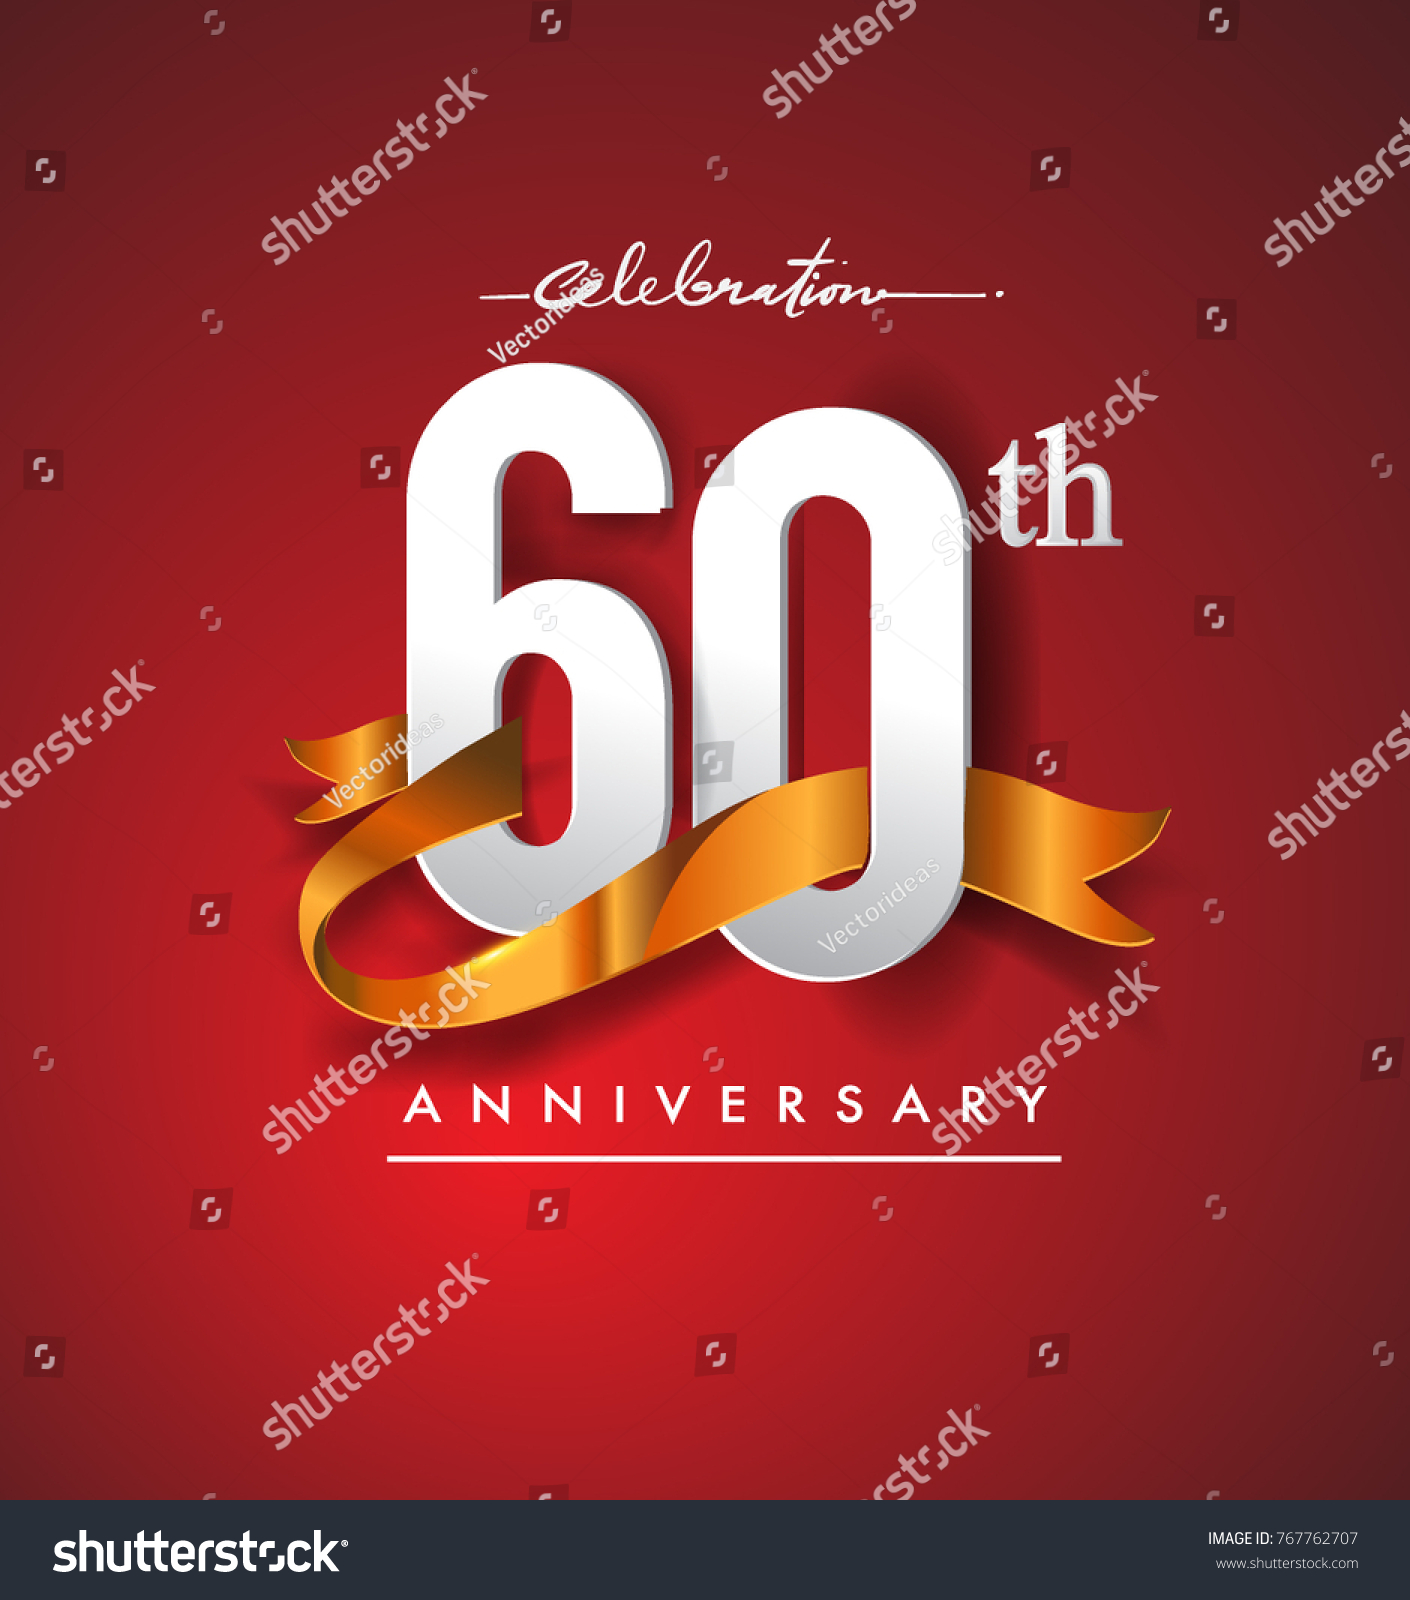 60th Anniversary Logotype Golden Ribbon Isolated Stock Vector ...